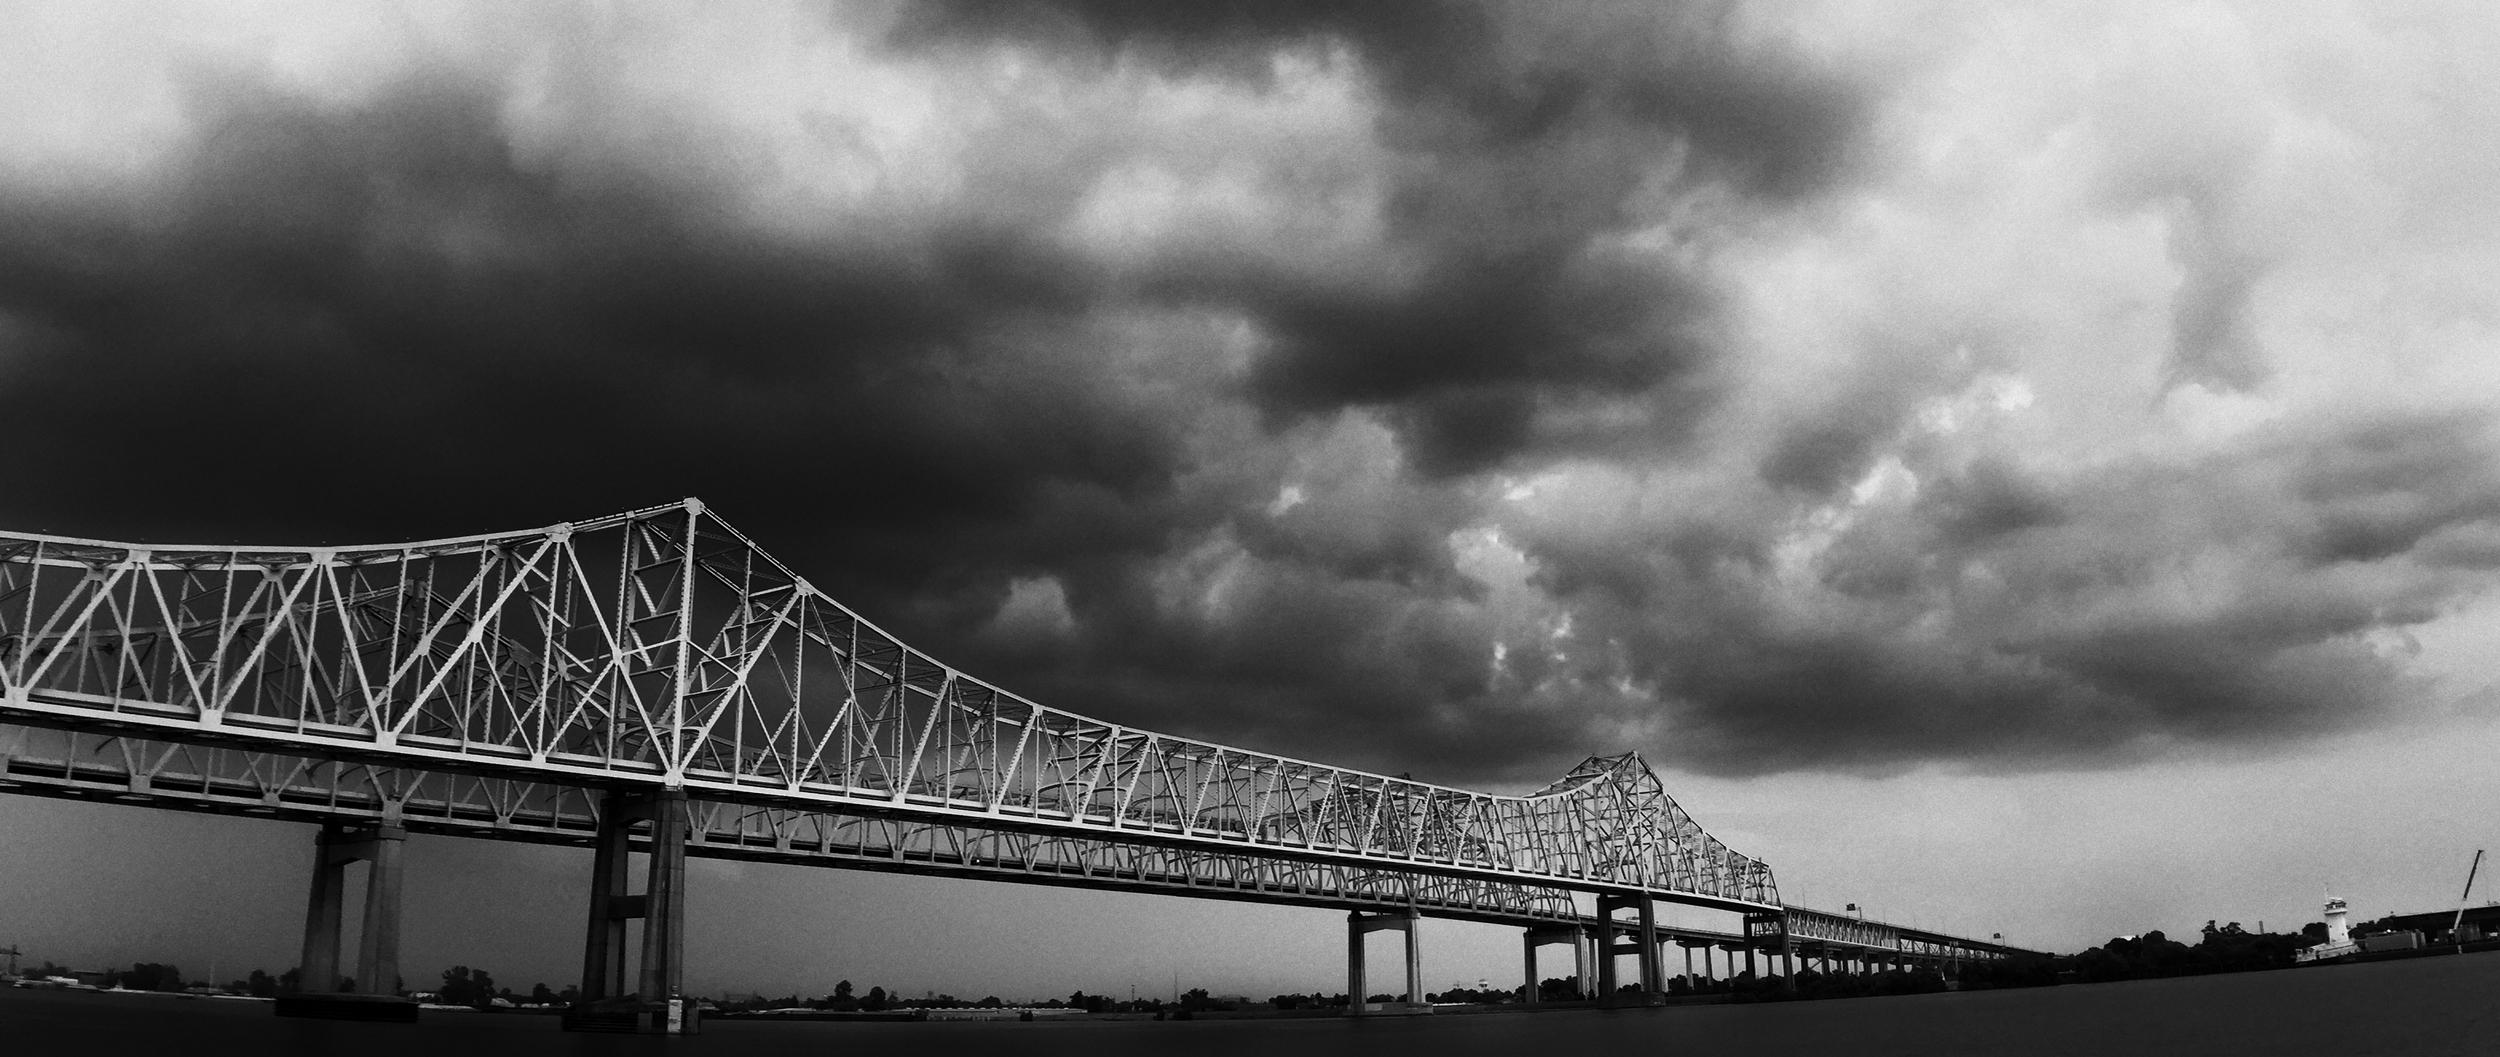 NOLA_Bridge_01.jpg